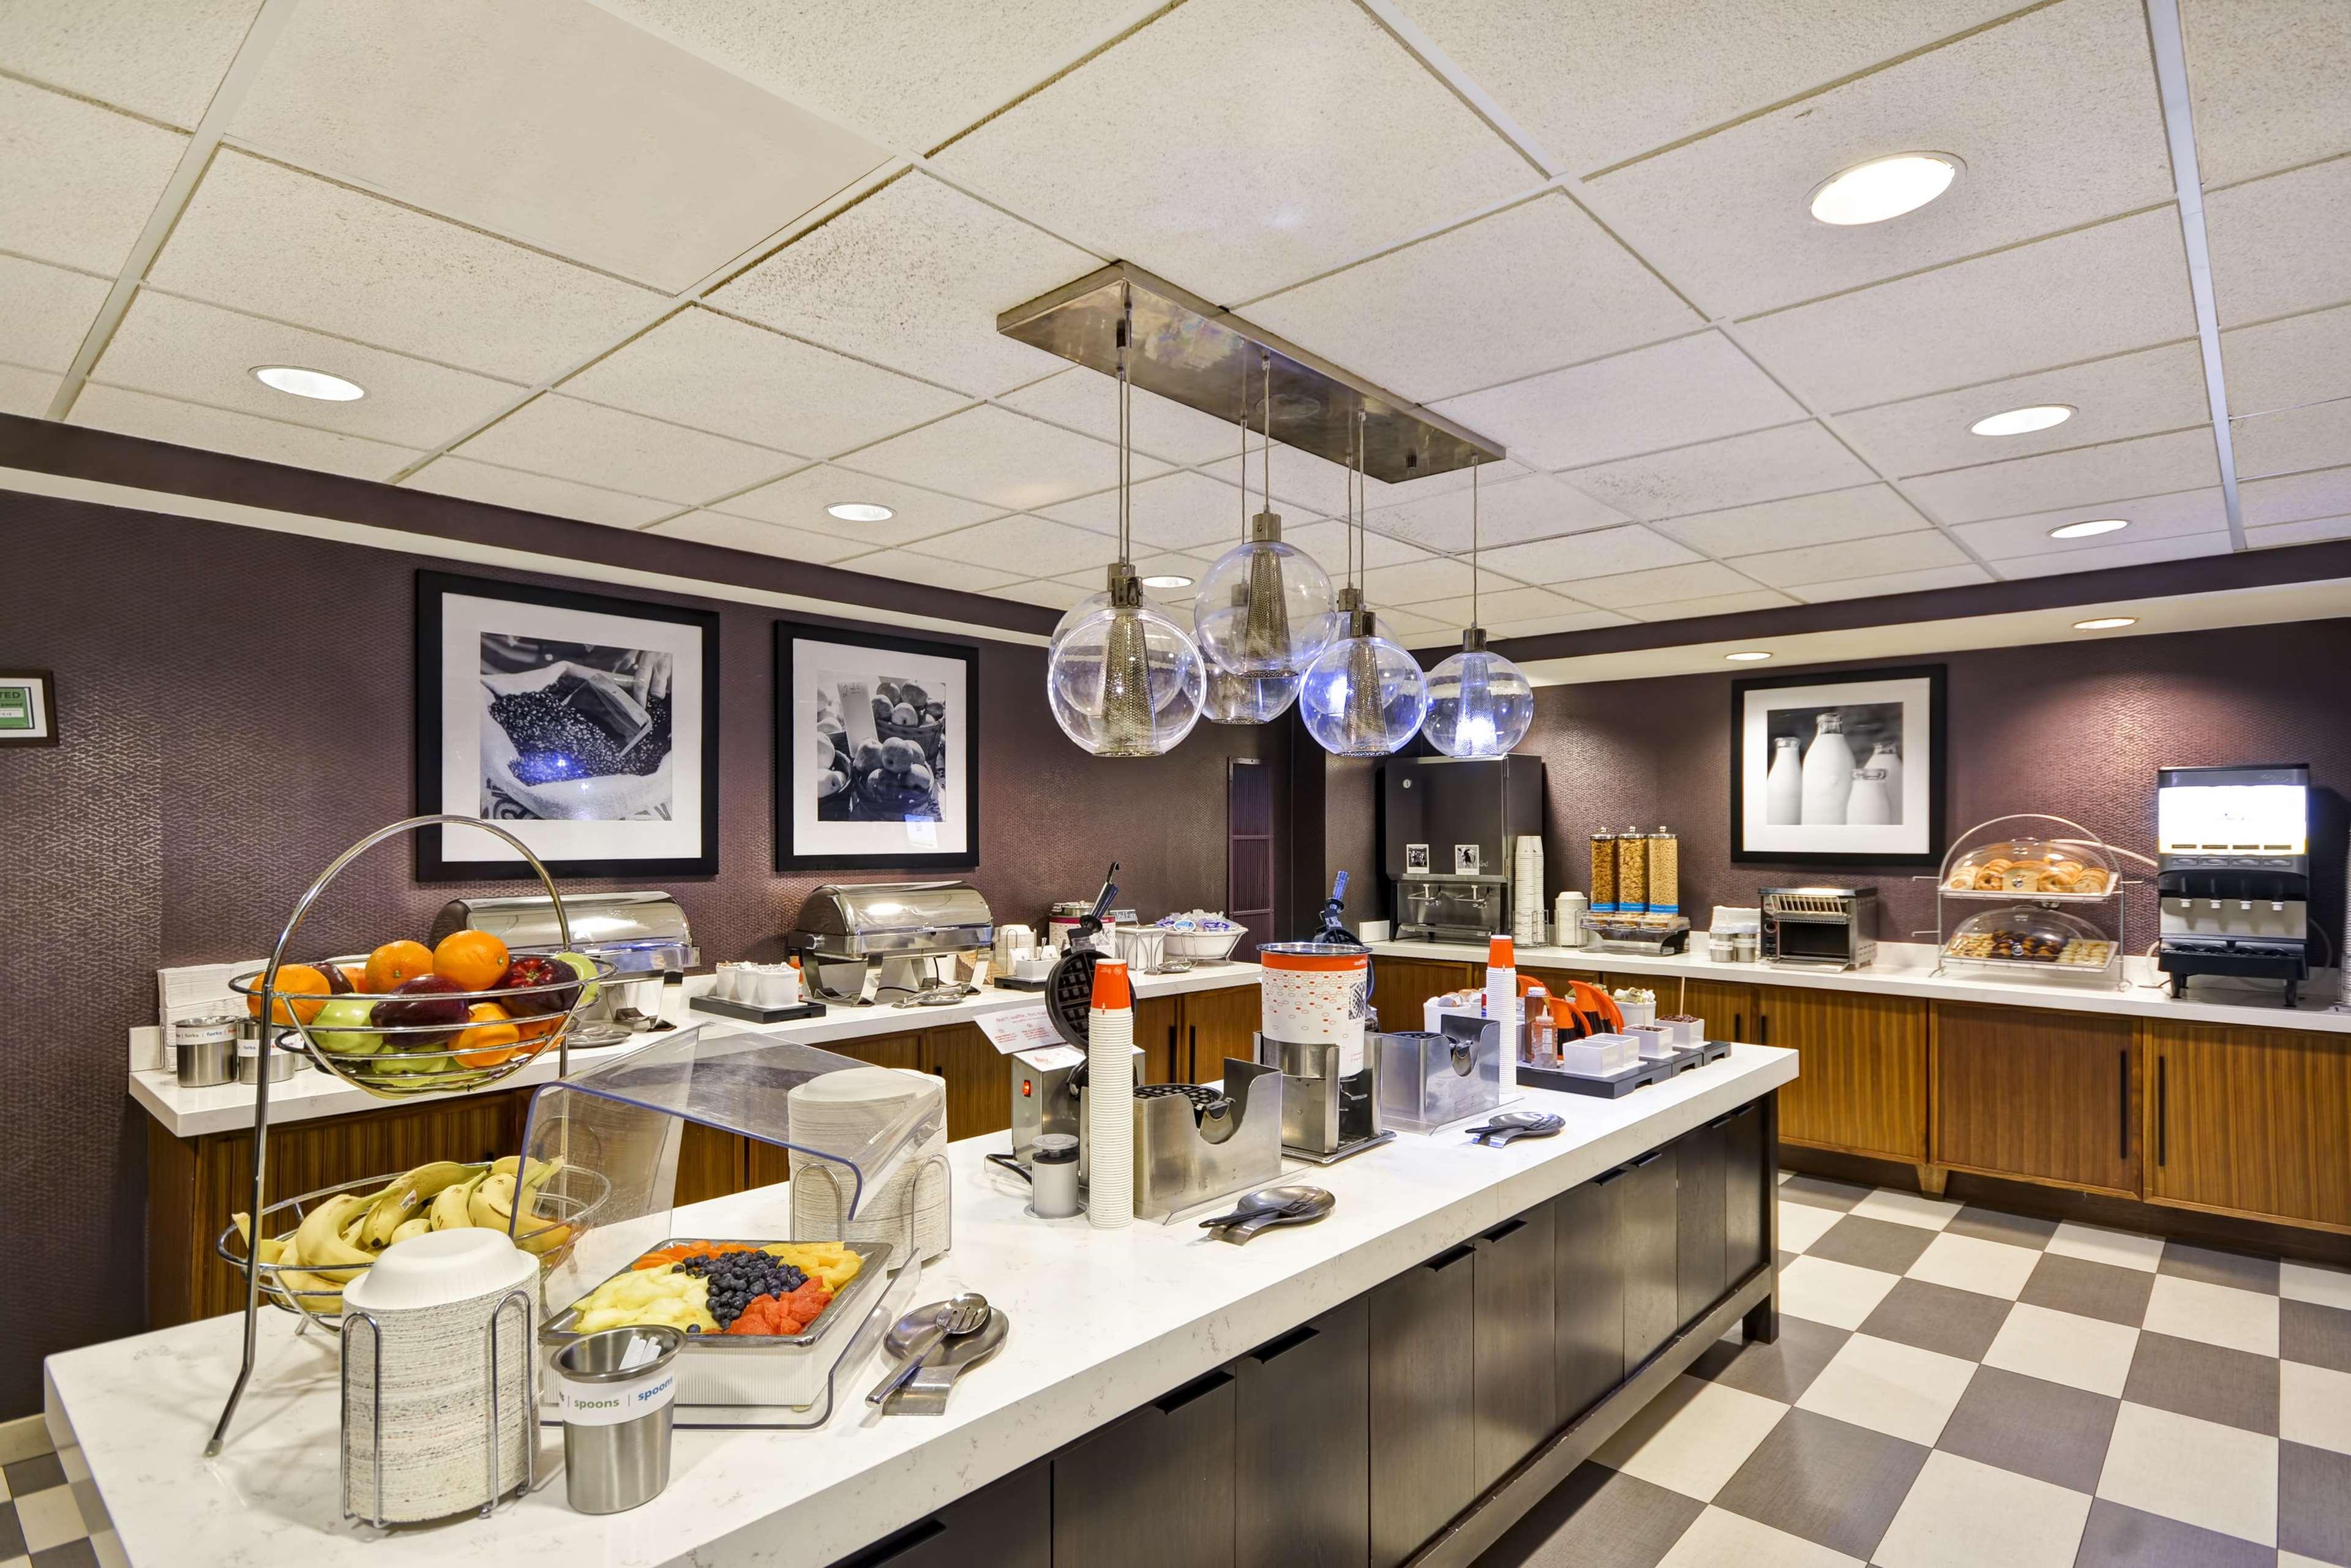 Hampton Inn & Suites Columbus-Easton Area image 66